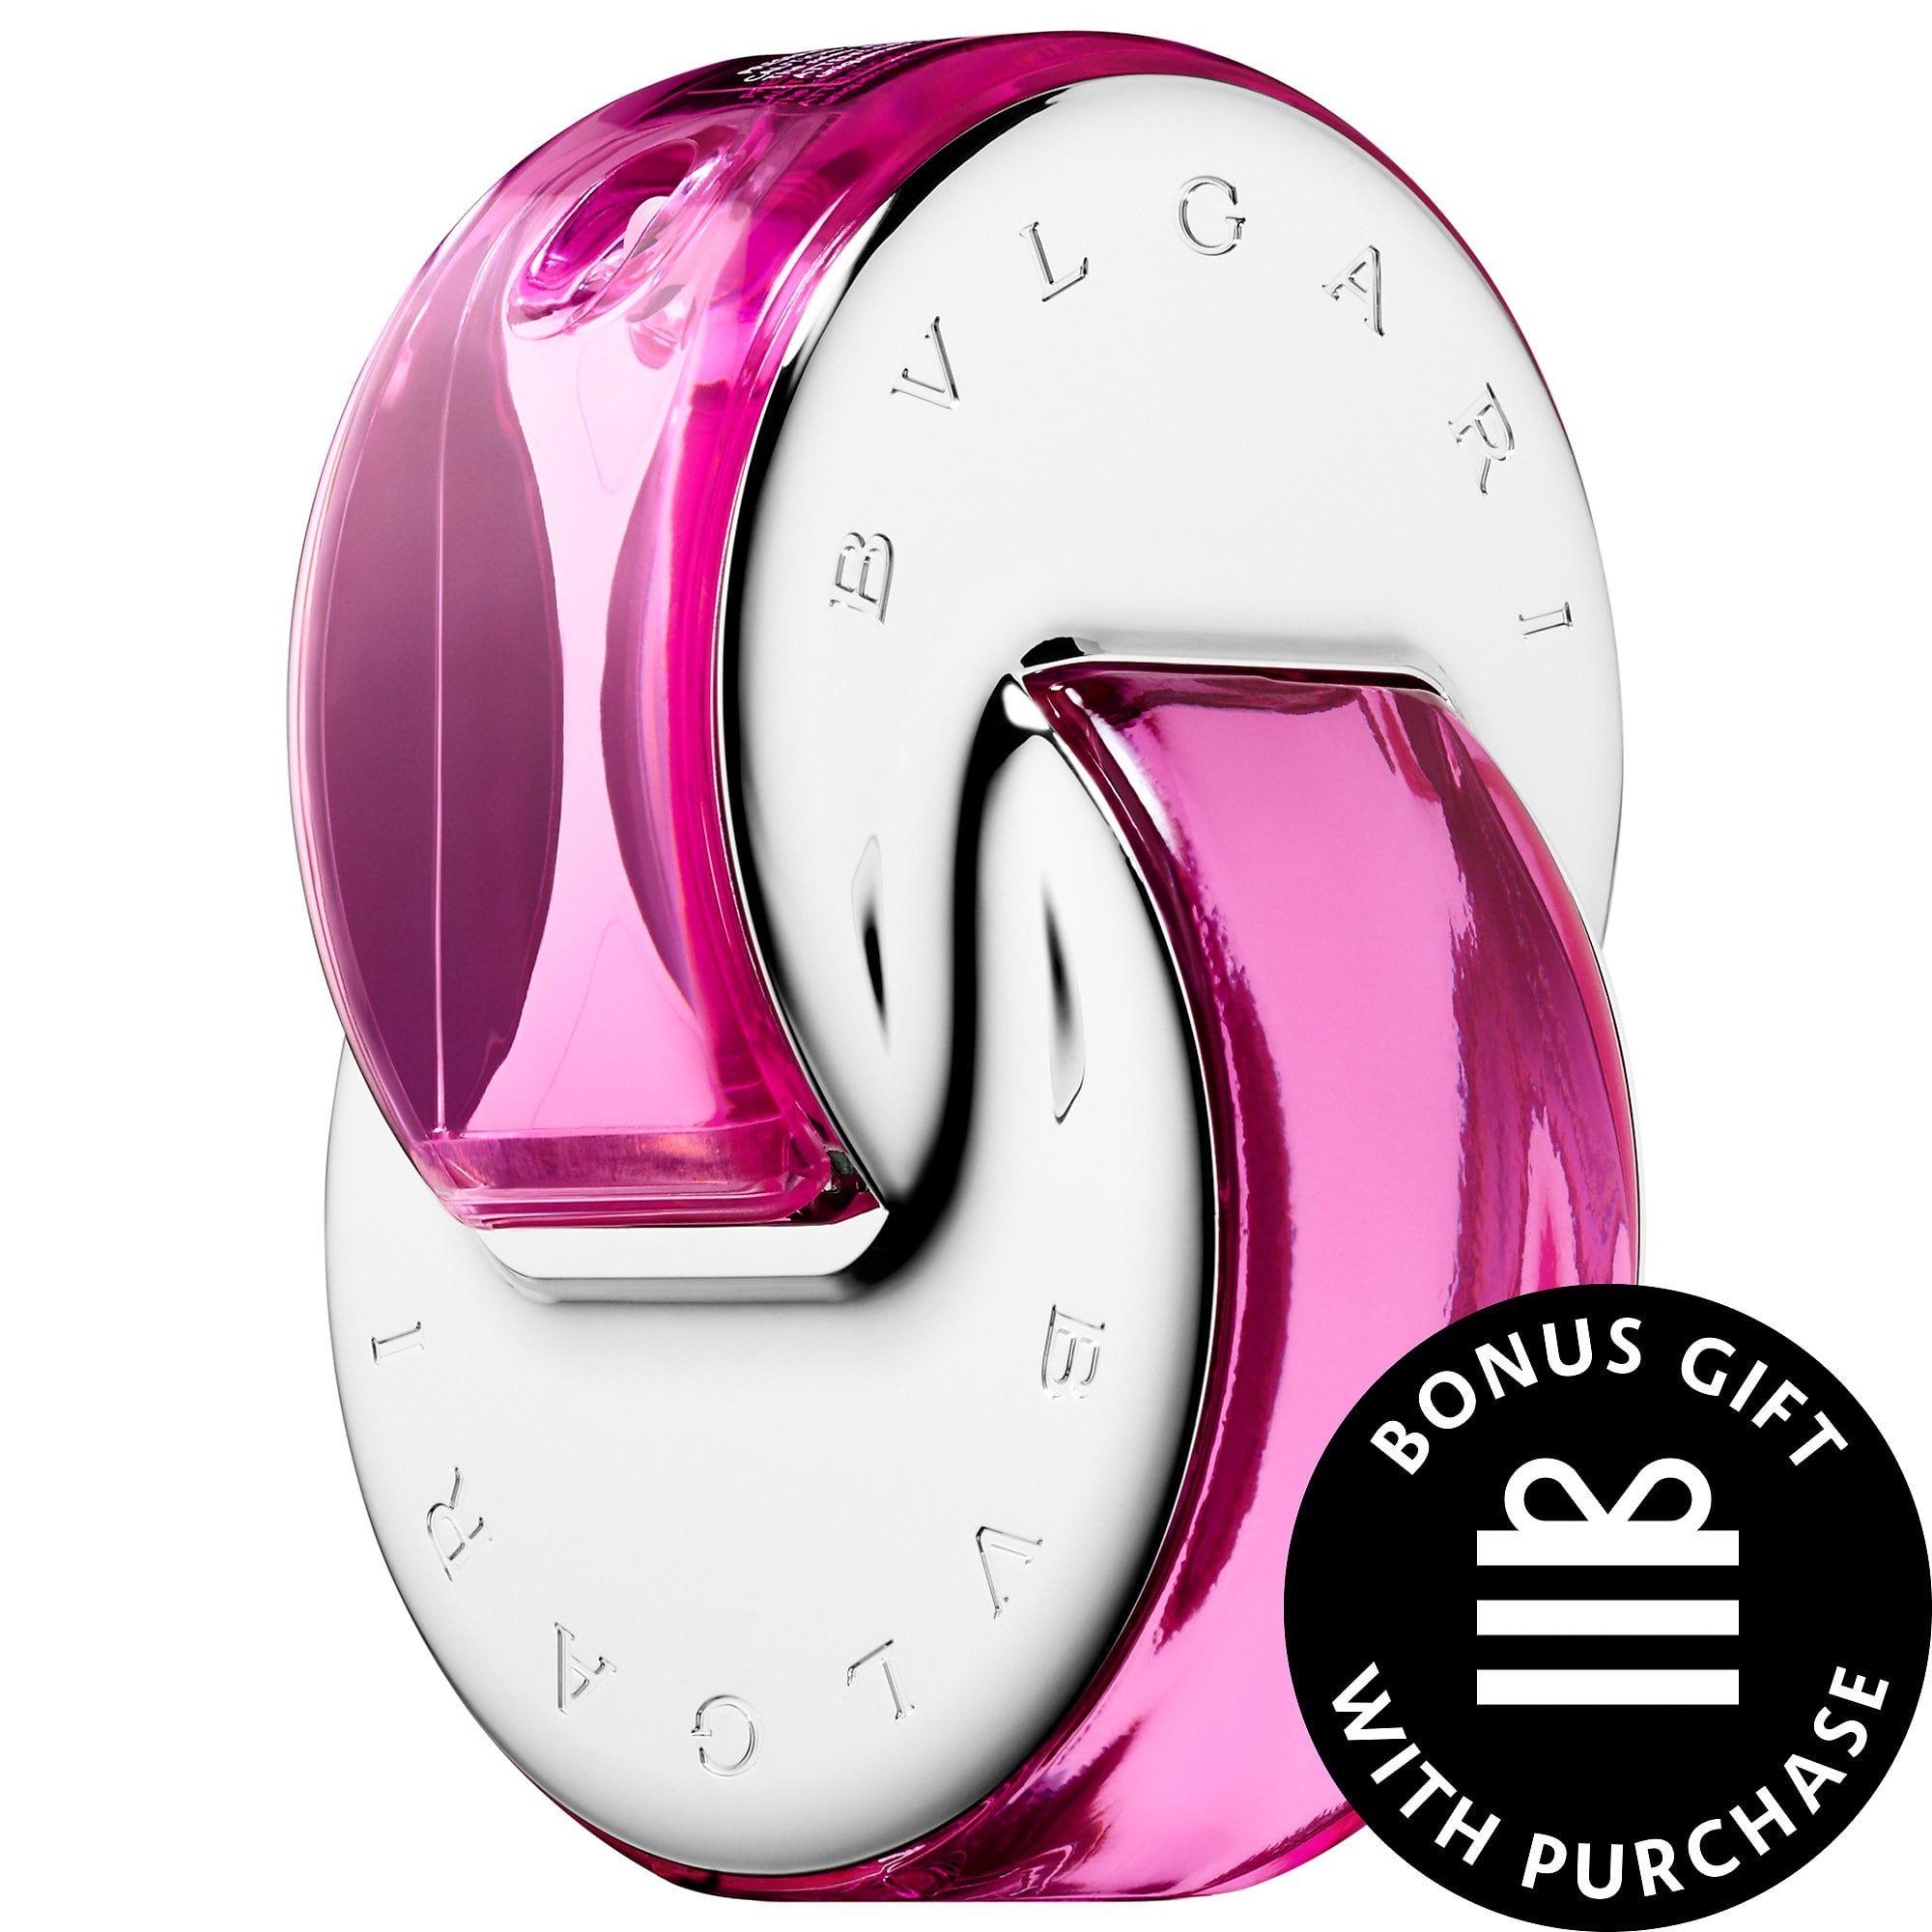 Omnia Pink Sapphire Bvlgari Fragrance Pink Sapphire Fragrance